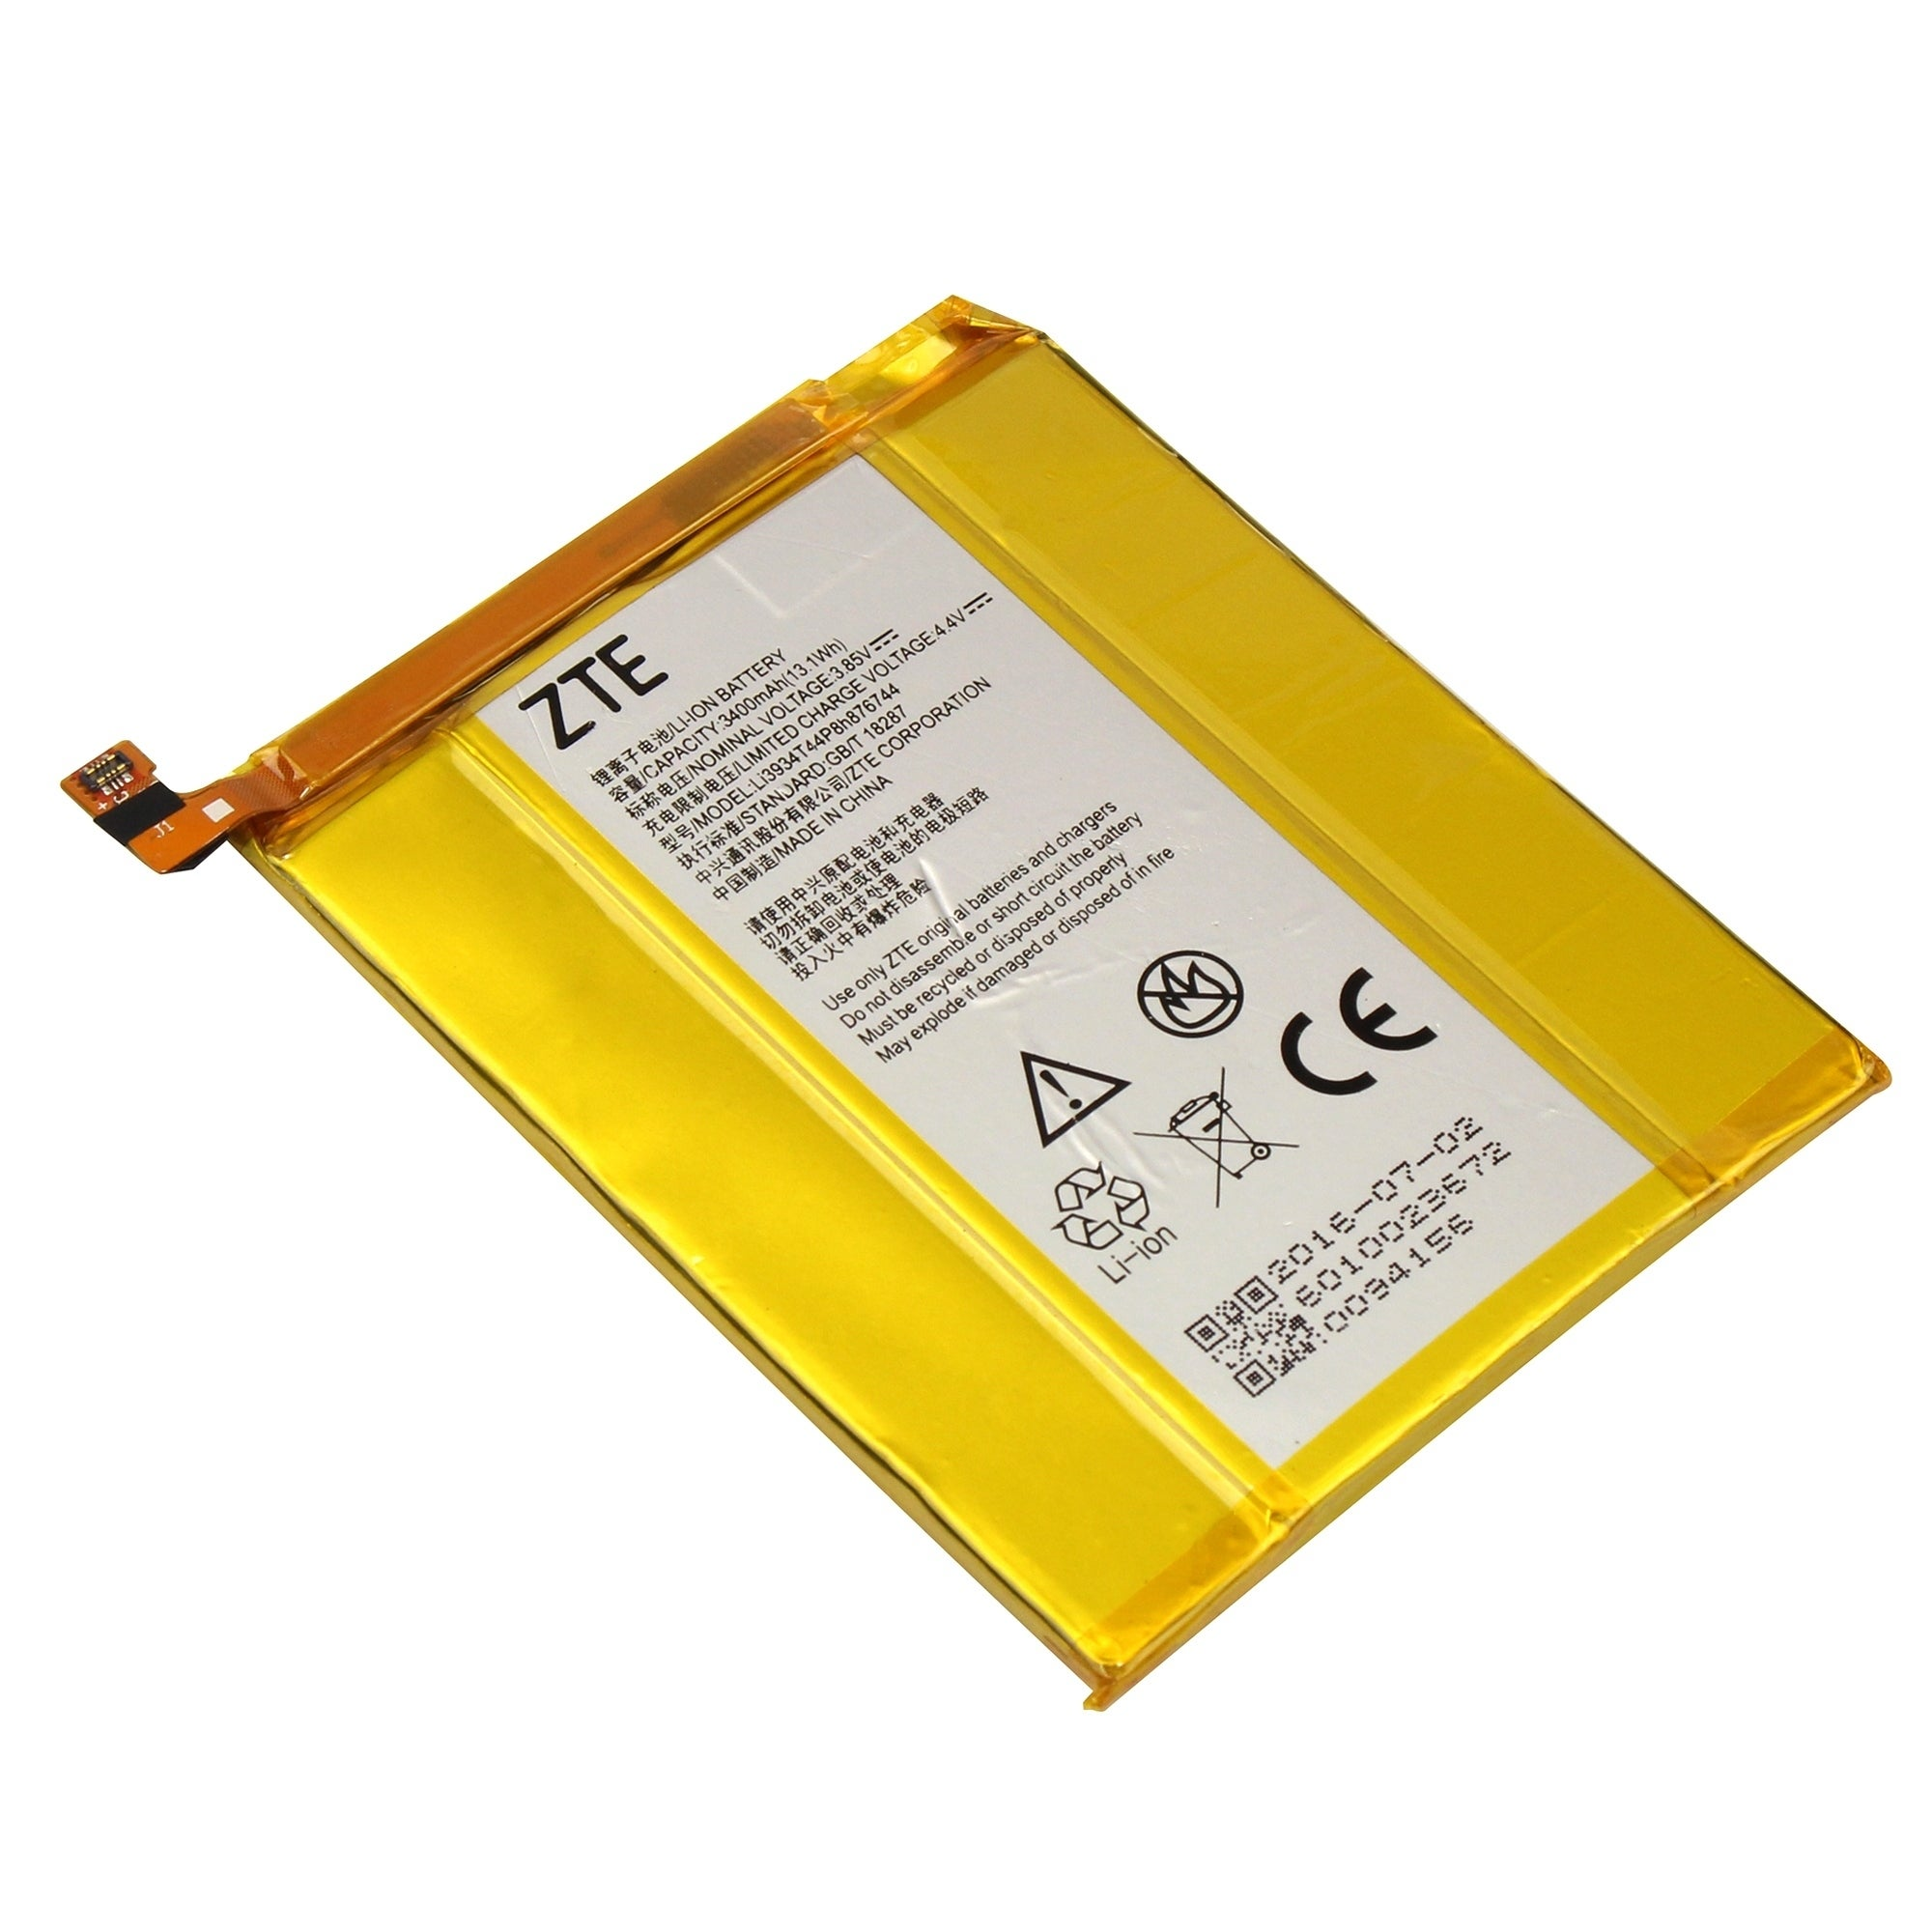 ZTE OEM Standard Battery LI3934T44P8H876744 for ZTE Grand X Max 2 (Bulk  Packaging)